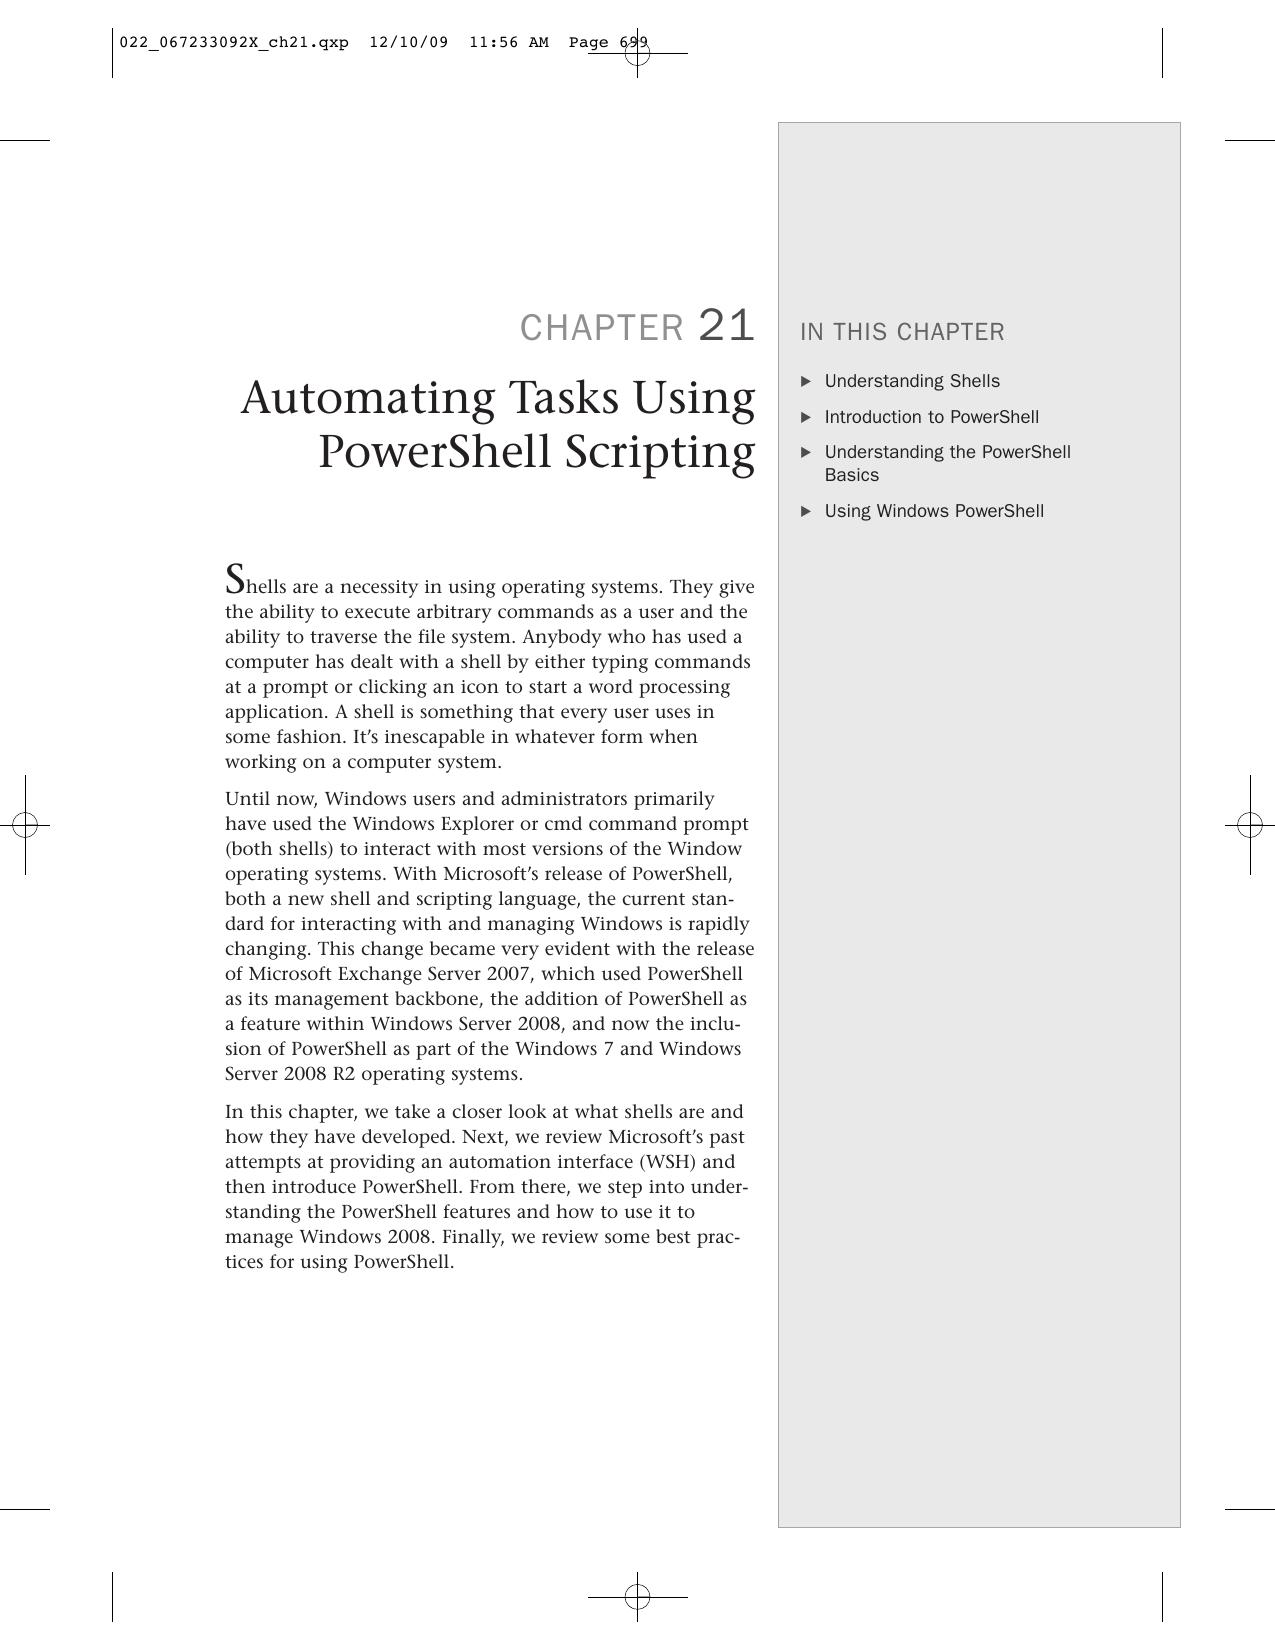 Automating Tasks Using PowerShell Scripting | manualzz com